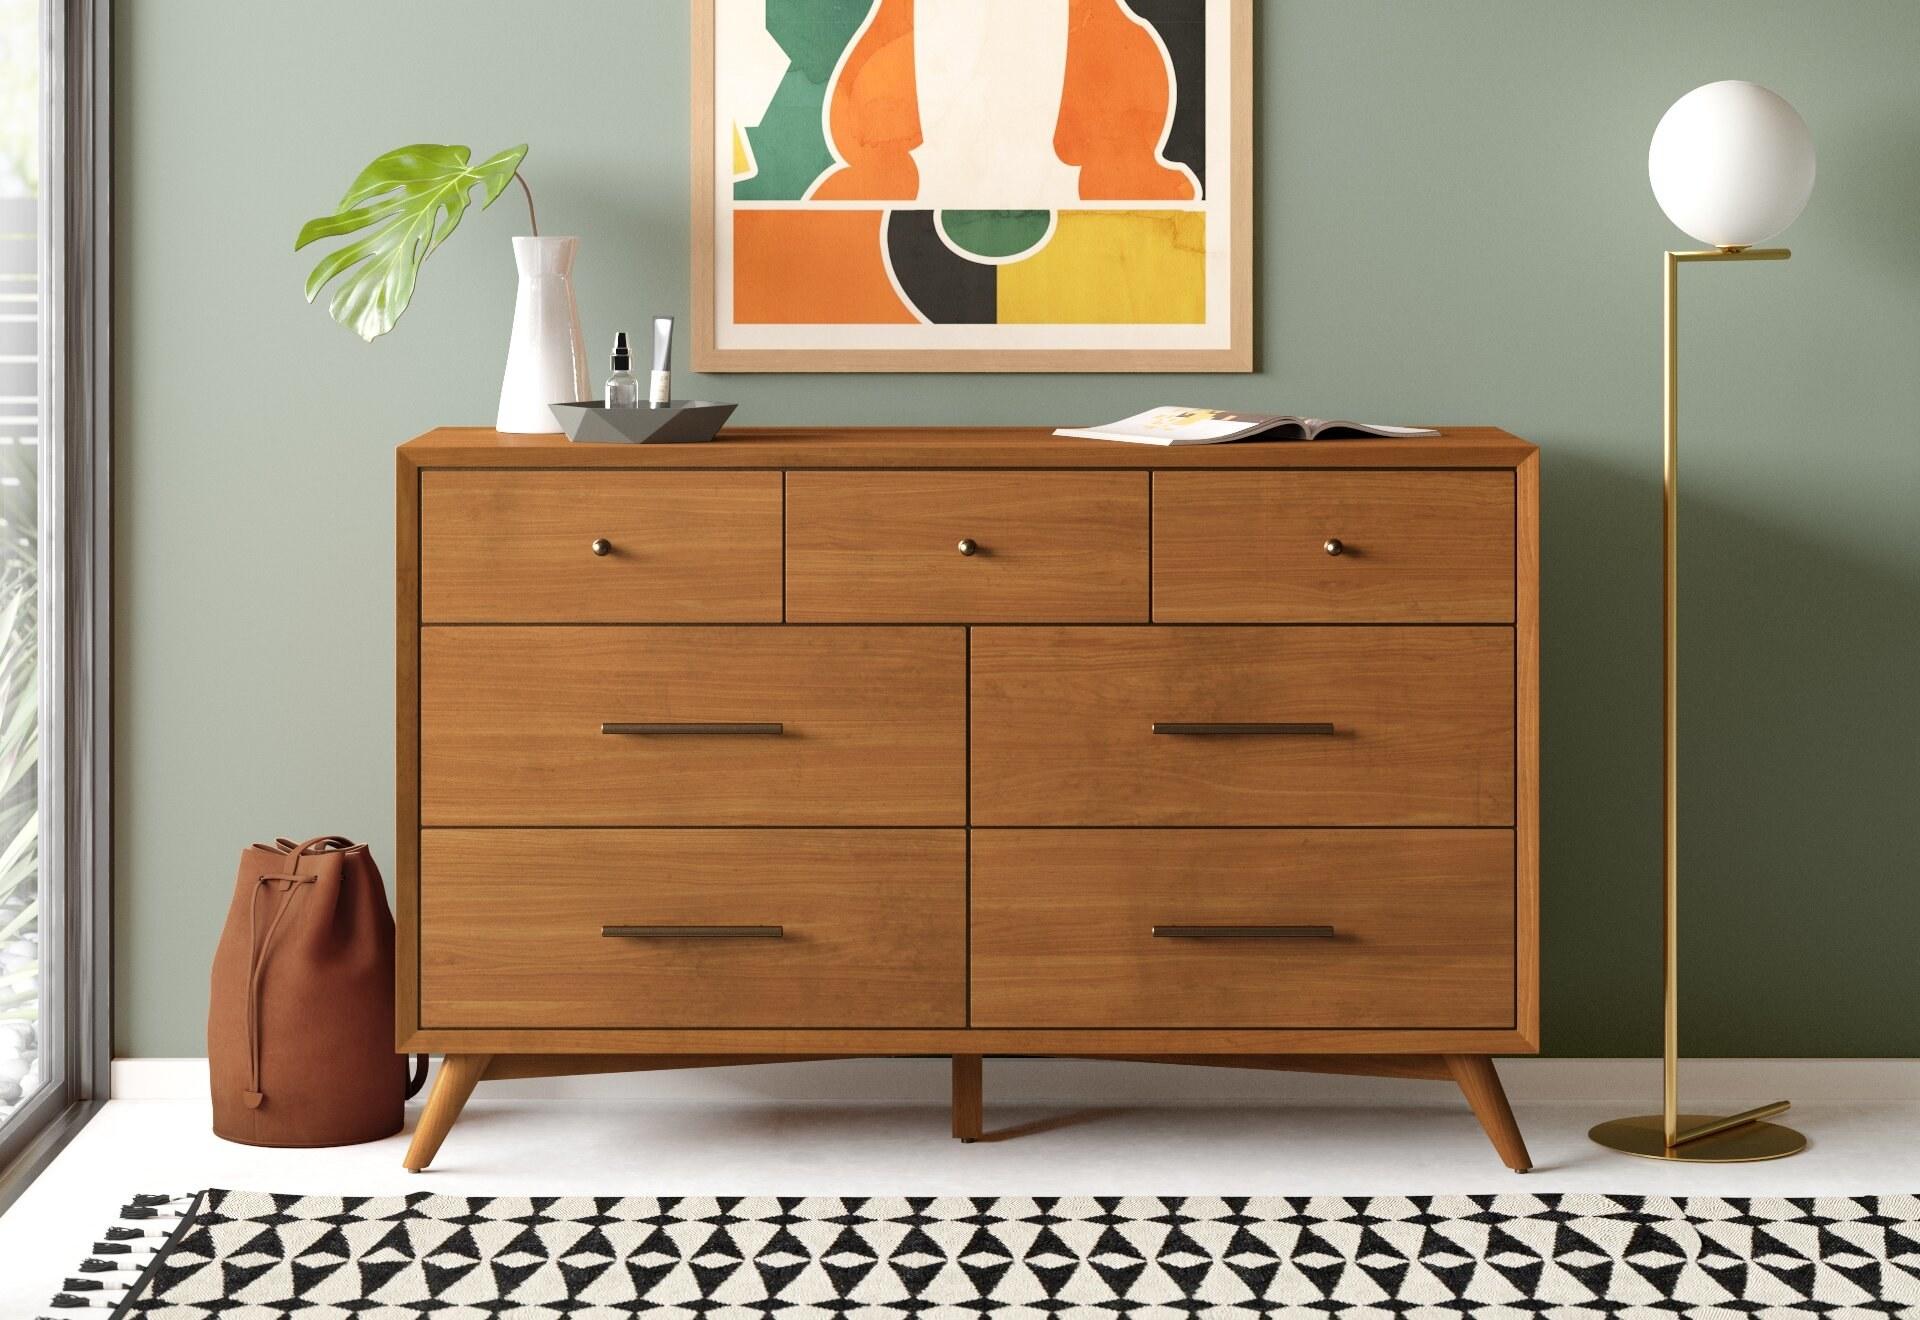 a seven-drawer mid-century modern dresser